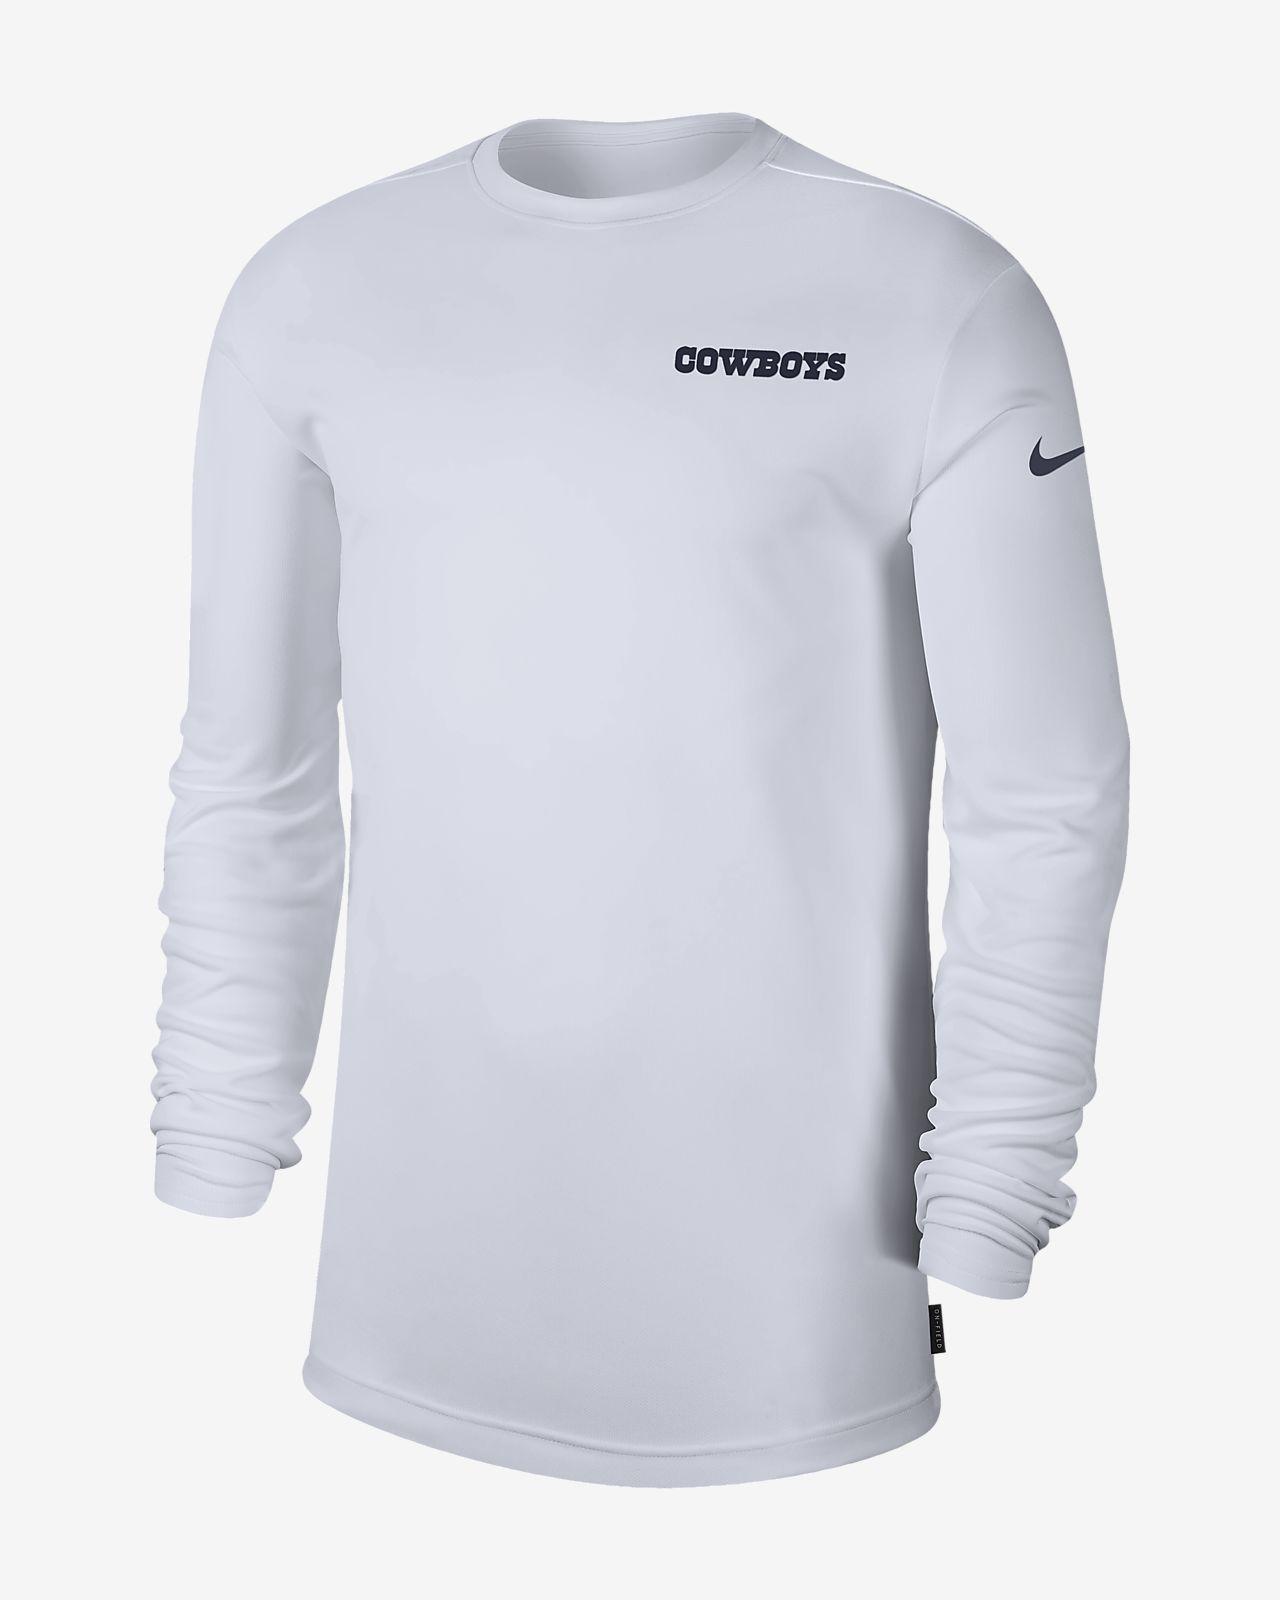 f366d59544d6 Nike Dri-FIT Coach (NFL Cowboys) Men s Long-Sleeve Top. Nike.com